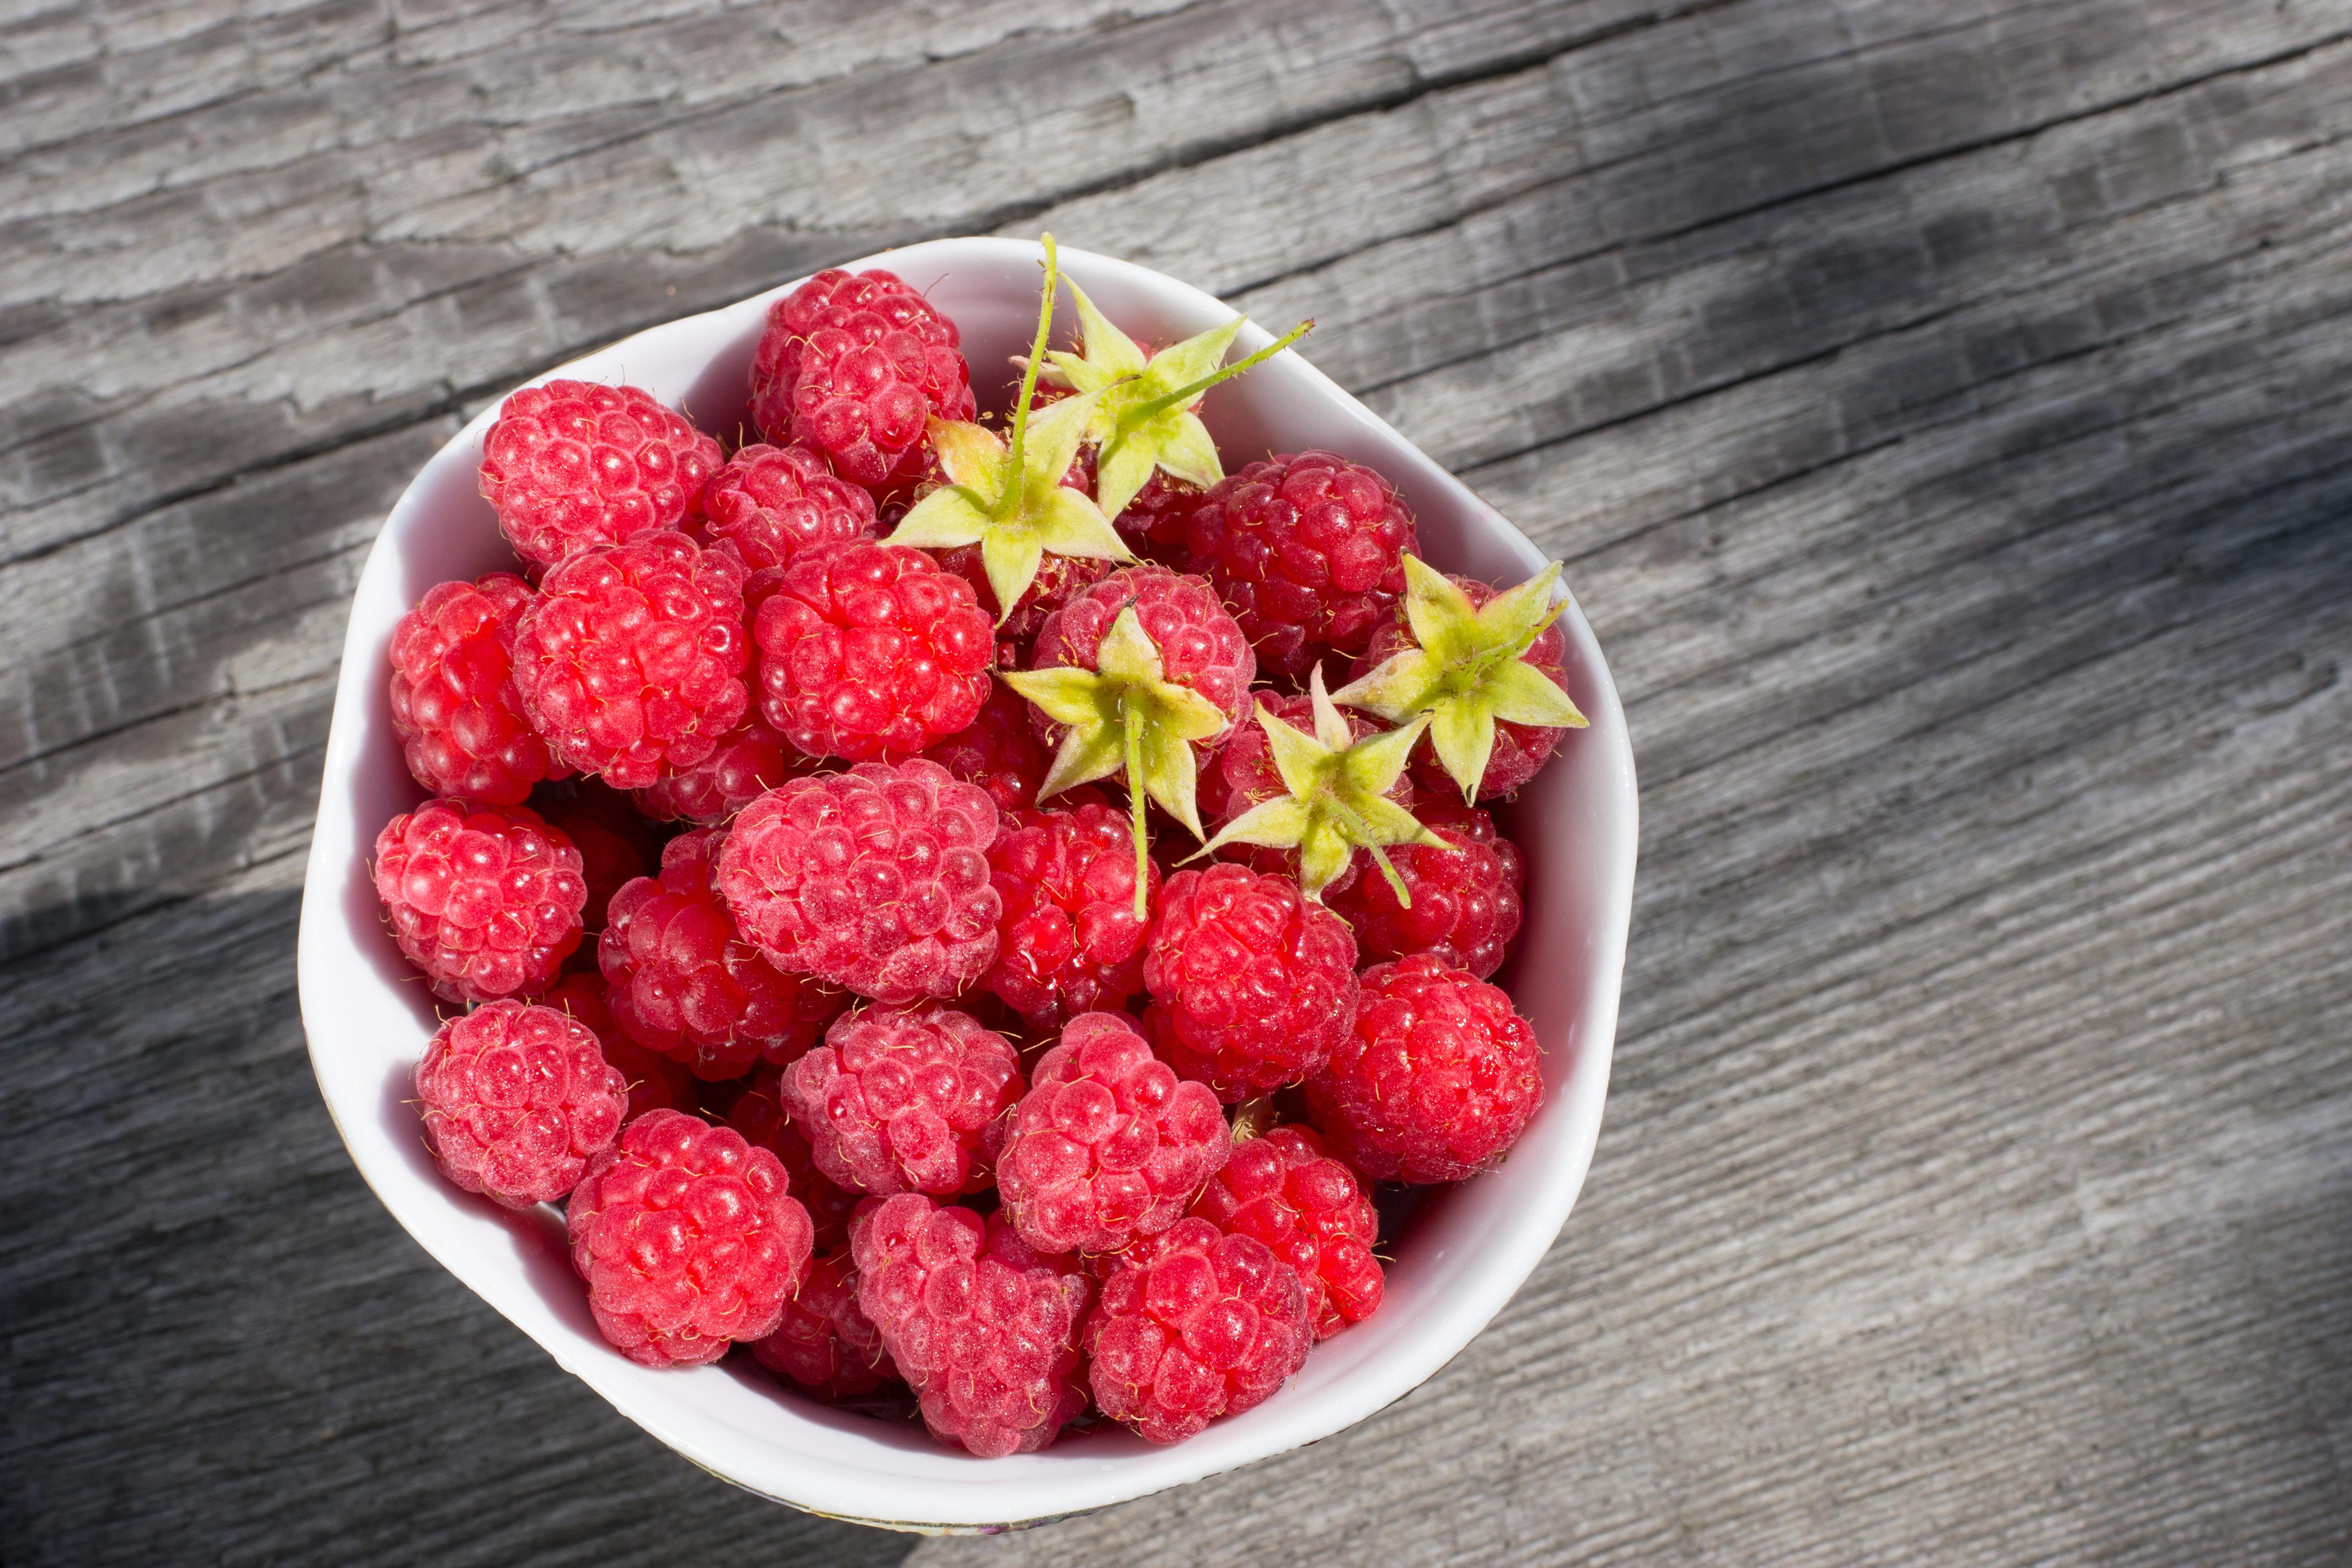 Appetizing juicy fresh raspberries in a white plate ...